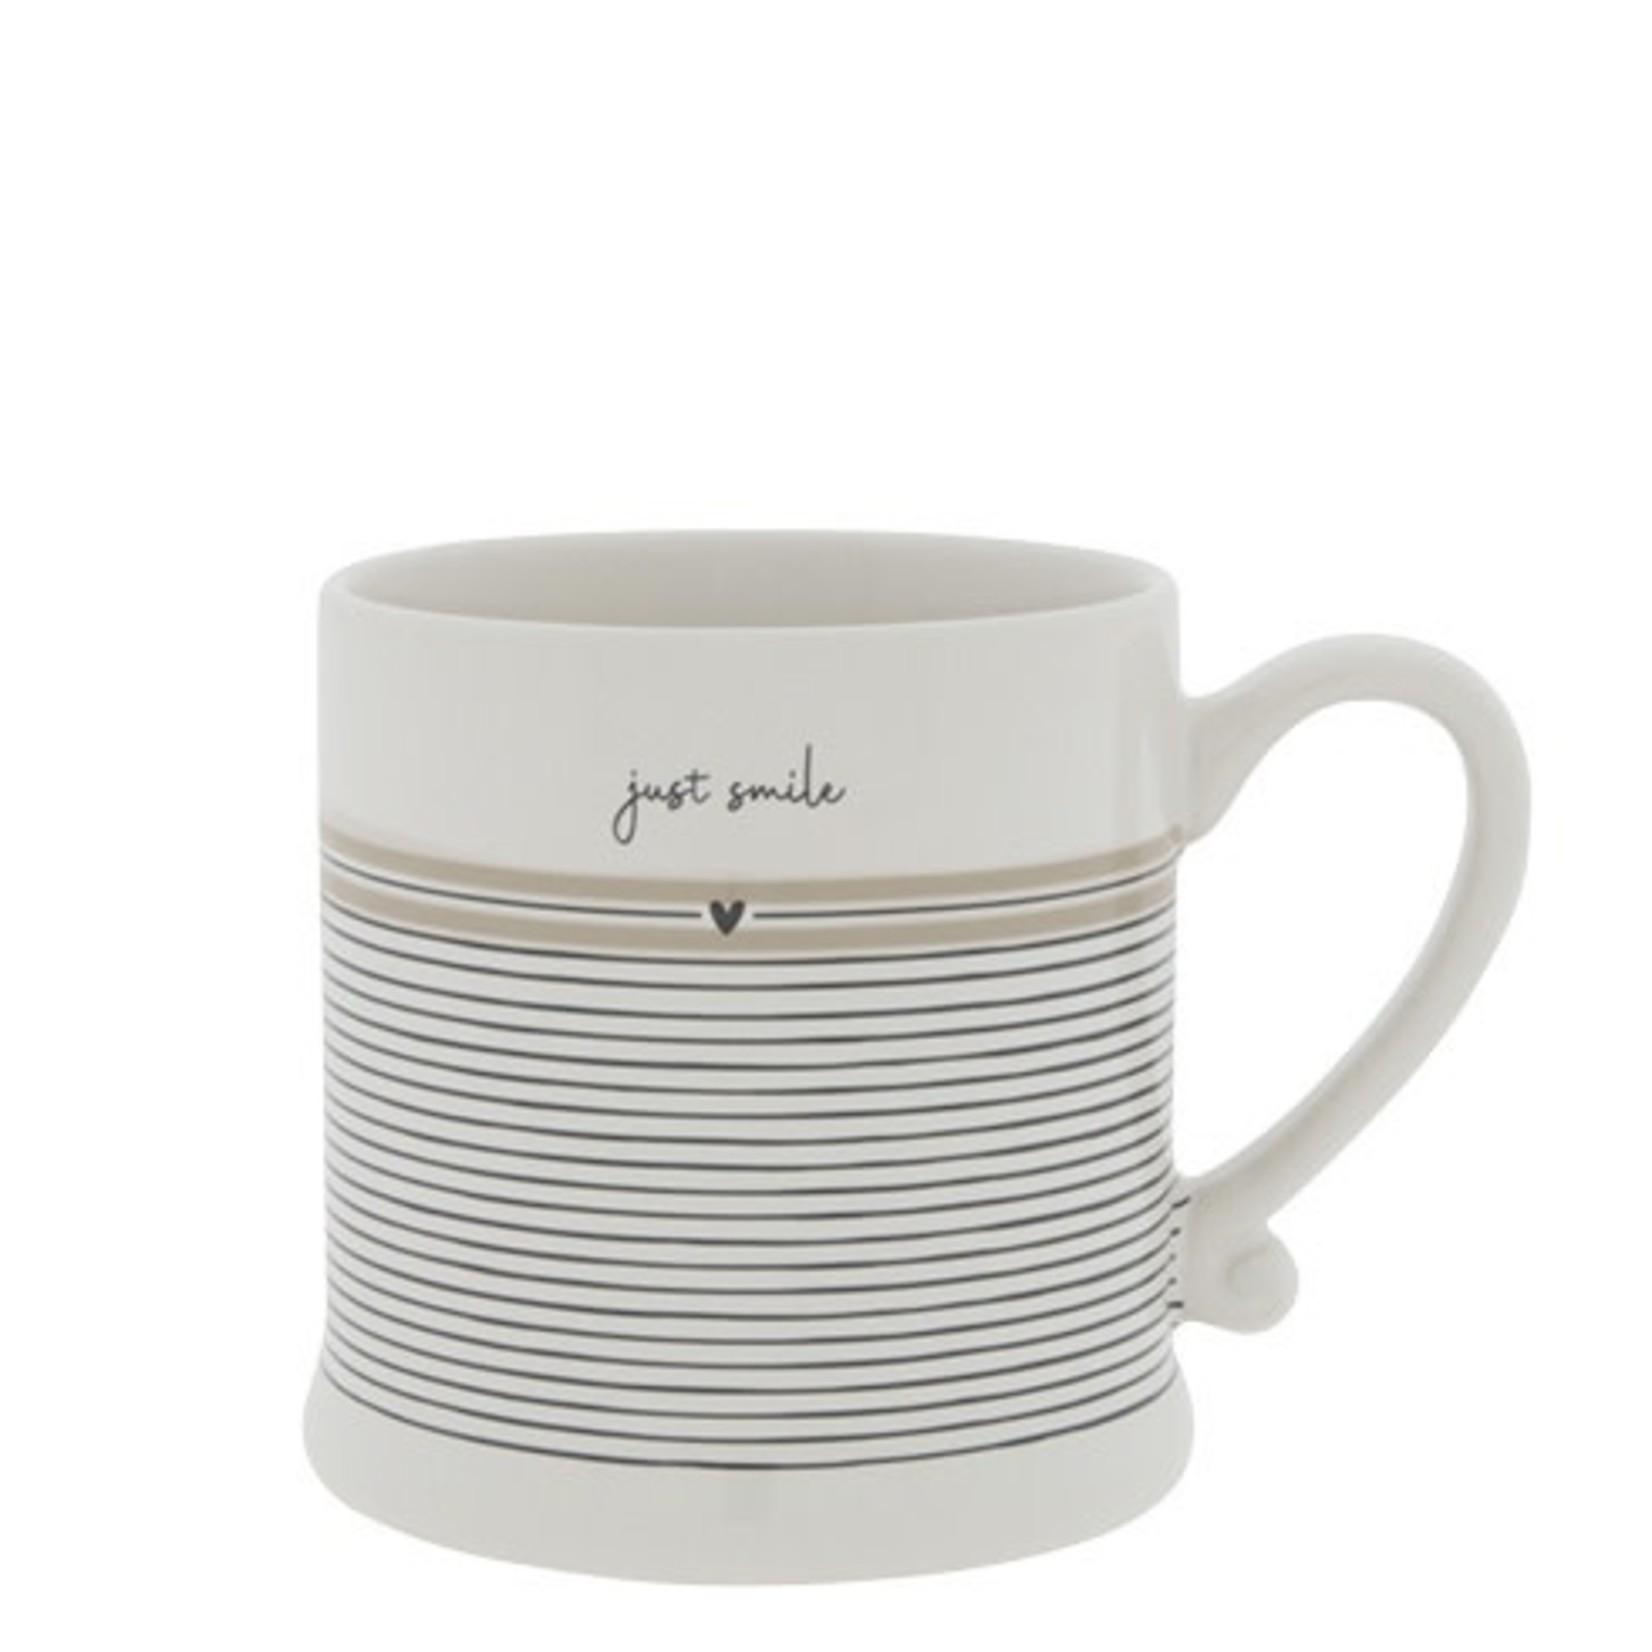 Bastion Collections Mug Just Smile stripes white/black/titane 8x7 cm